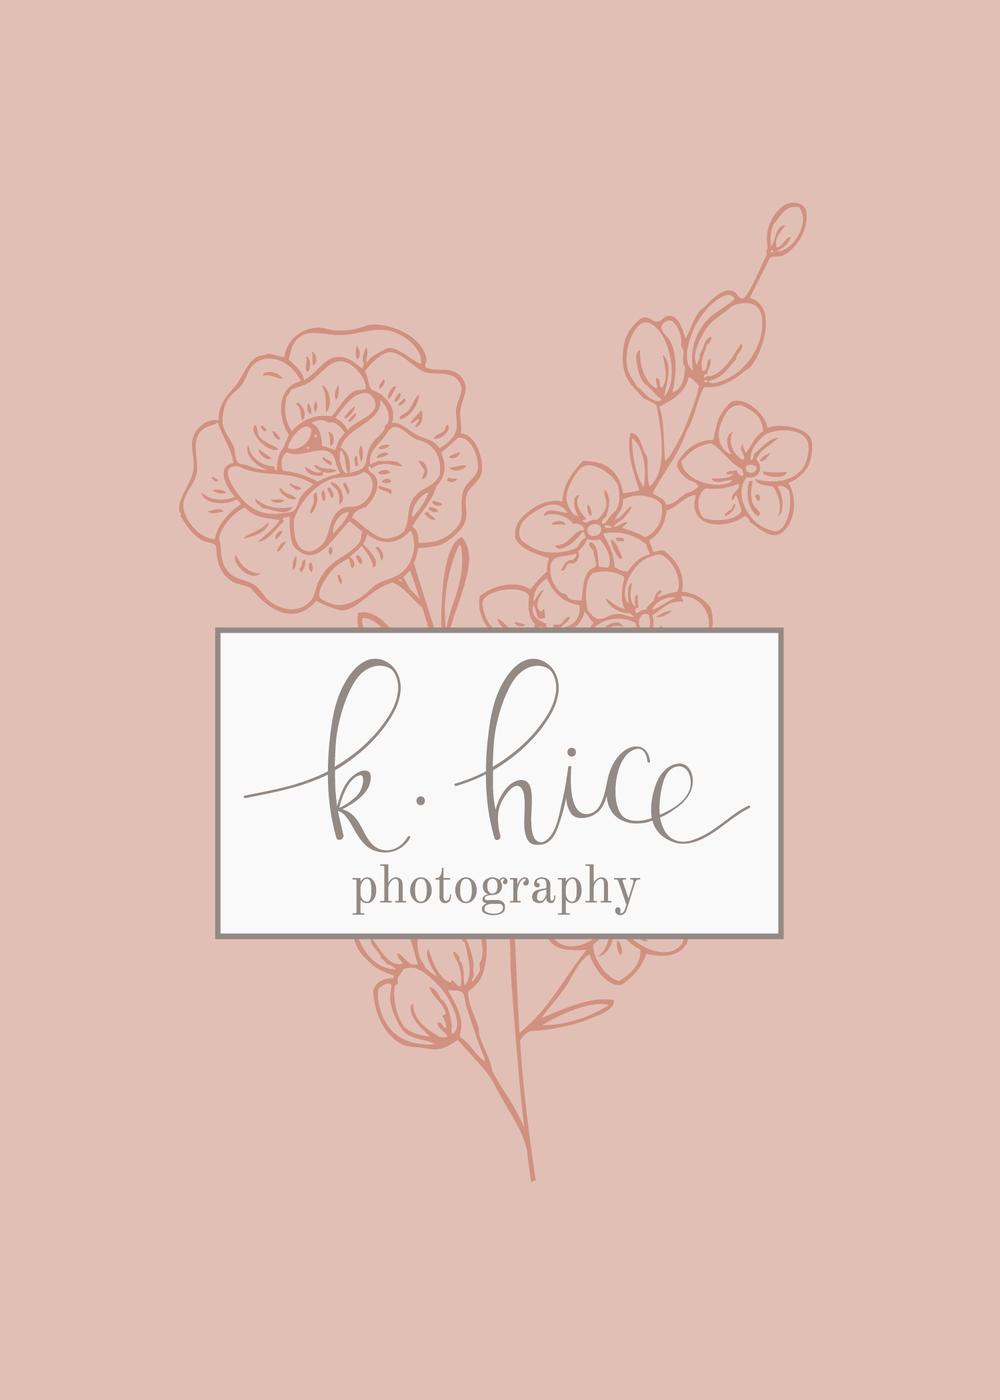 K. Hice Photography - Logo & Branding by Bea & Bloom Creative Design Studio